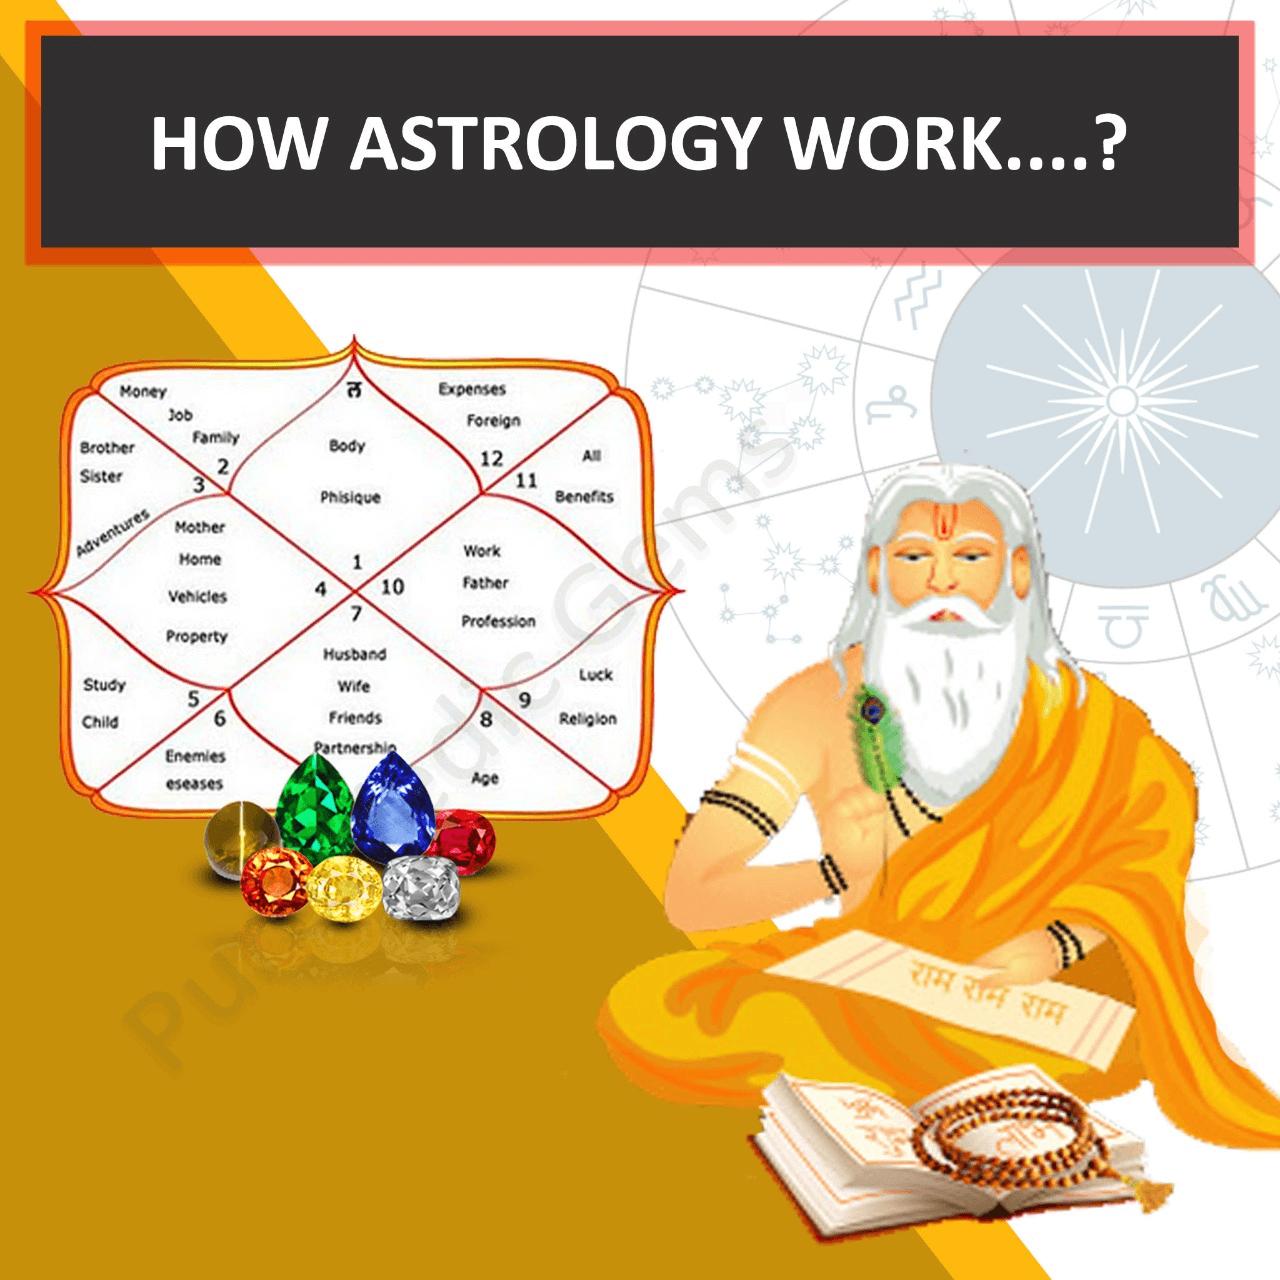 how astrology work?